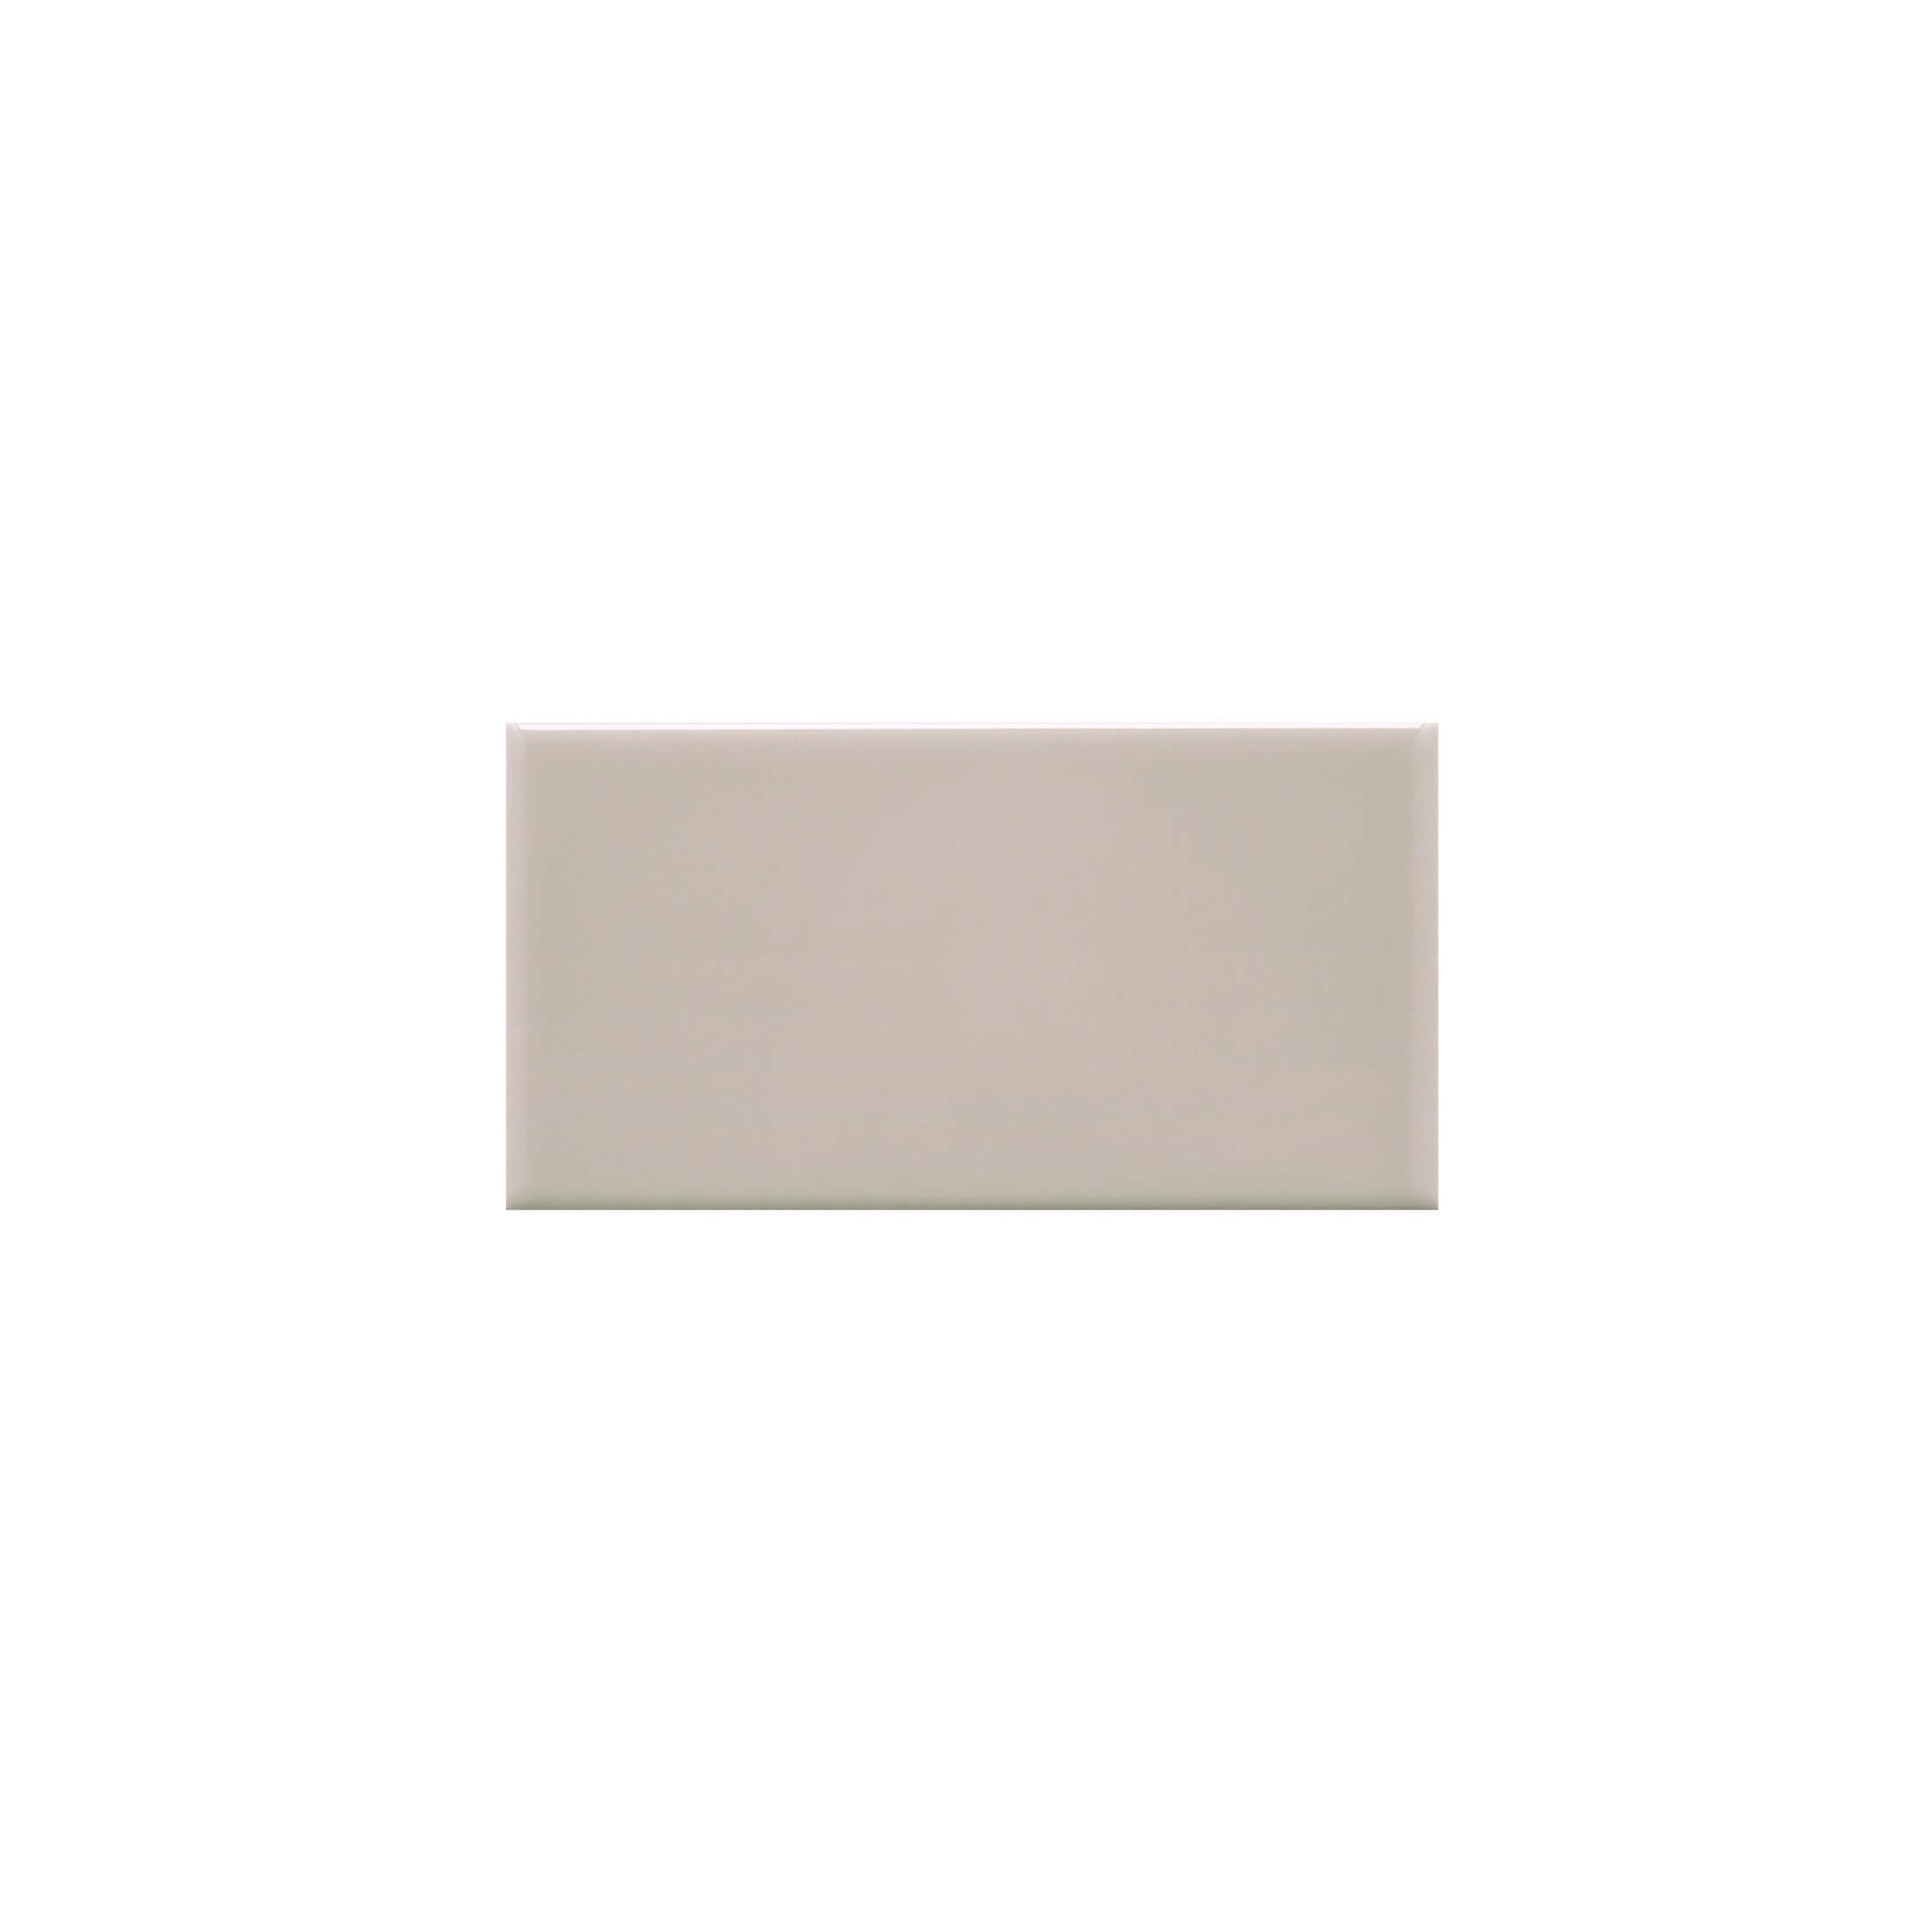 ADNE1091 - LISO PB - 7.5 cm X 15 cm